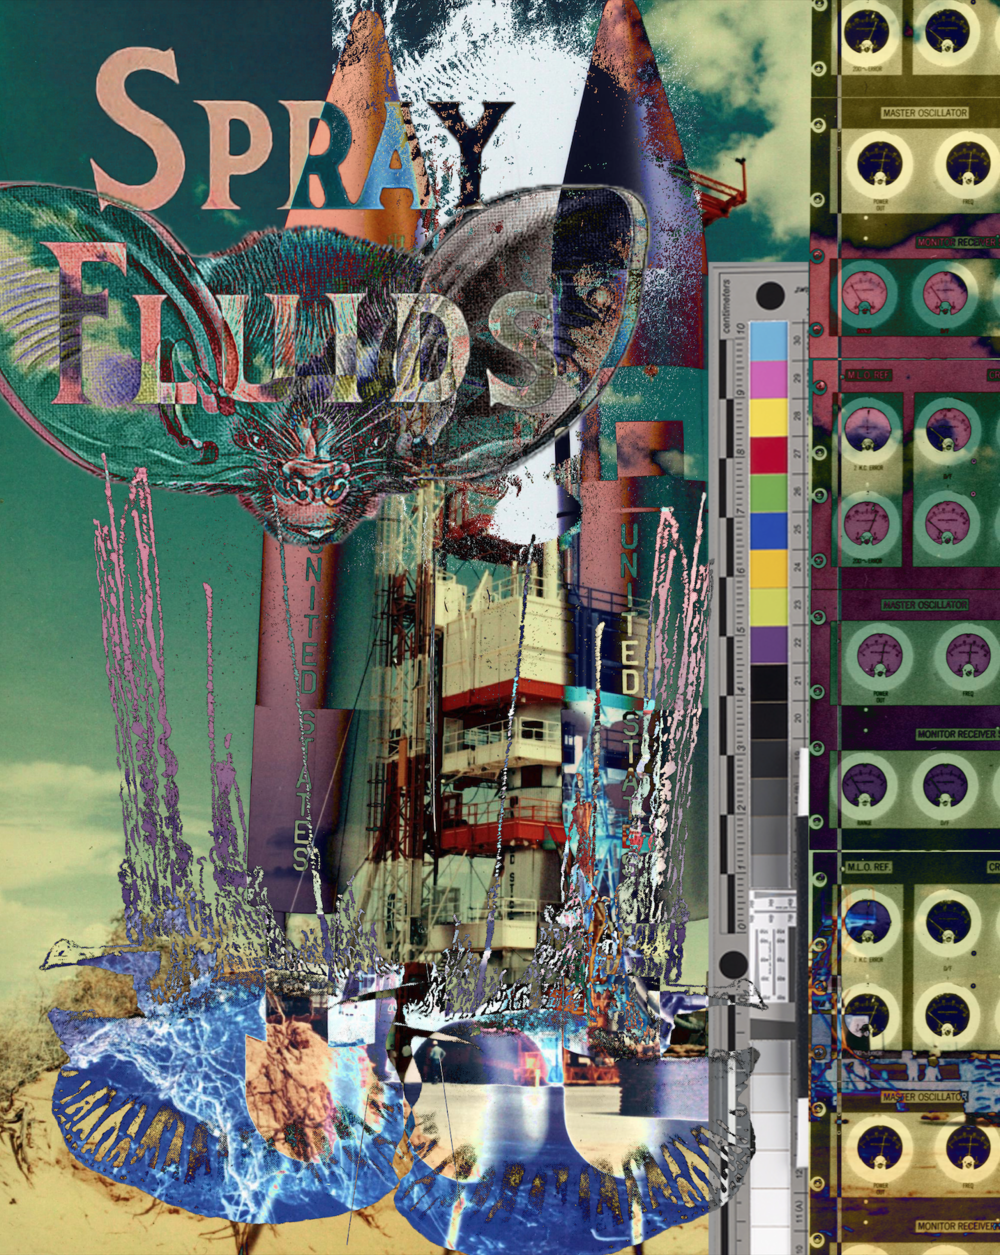 Spray Fluids